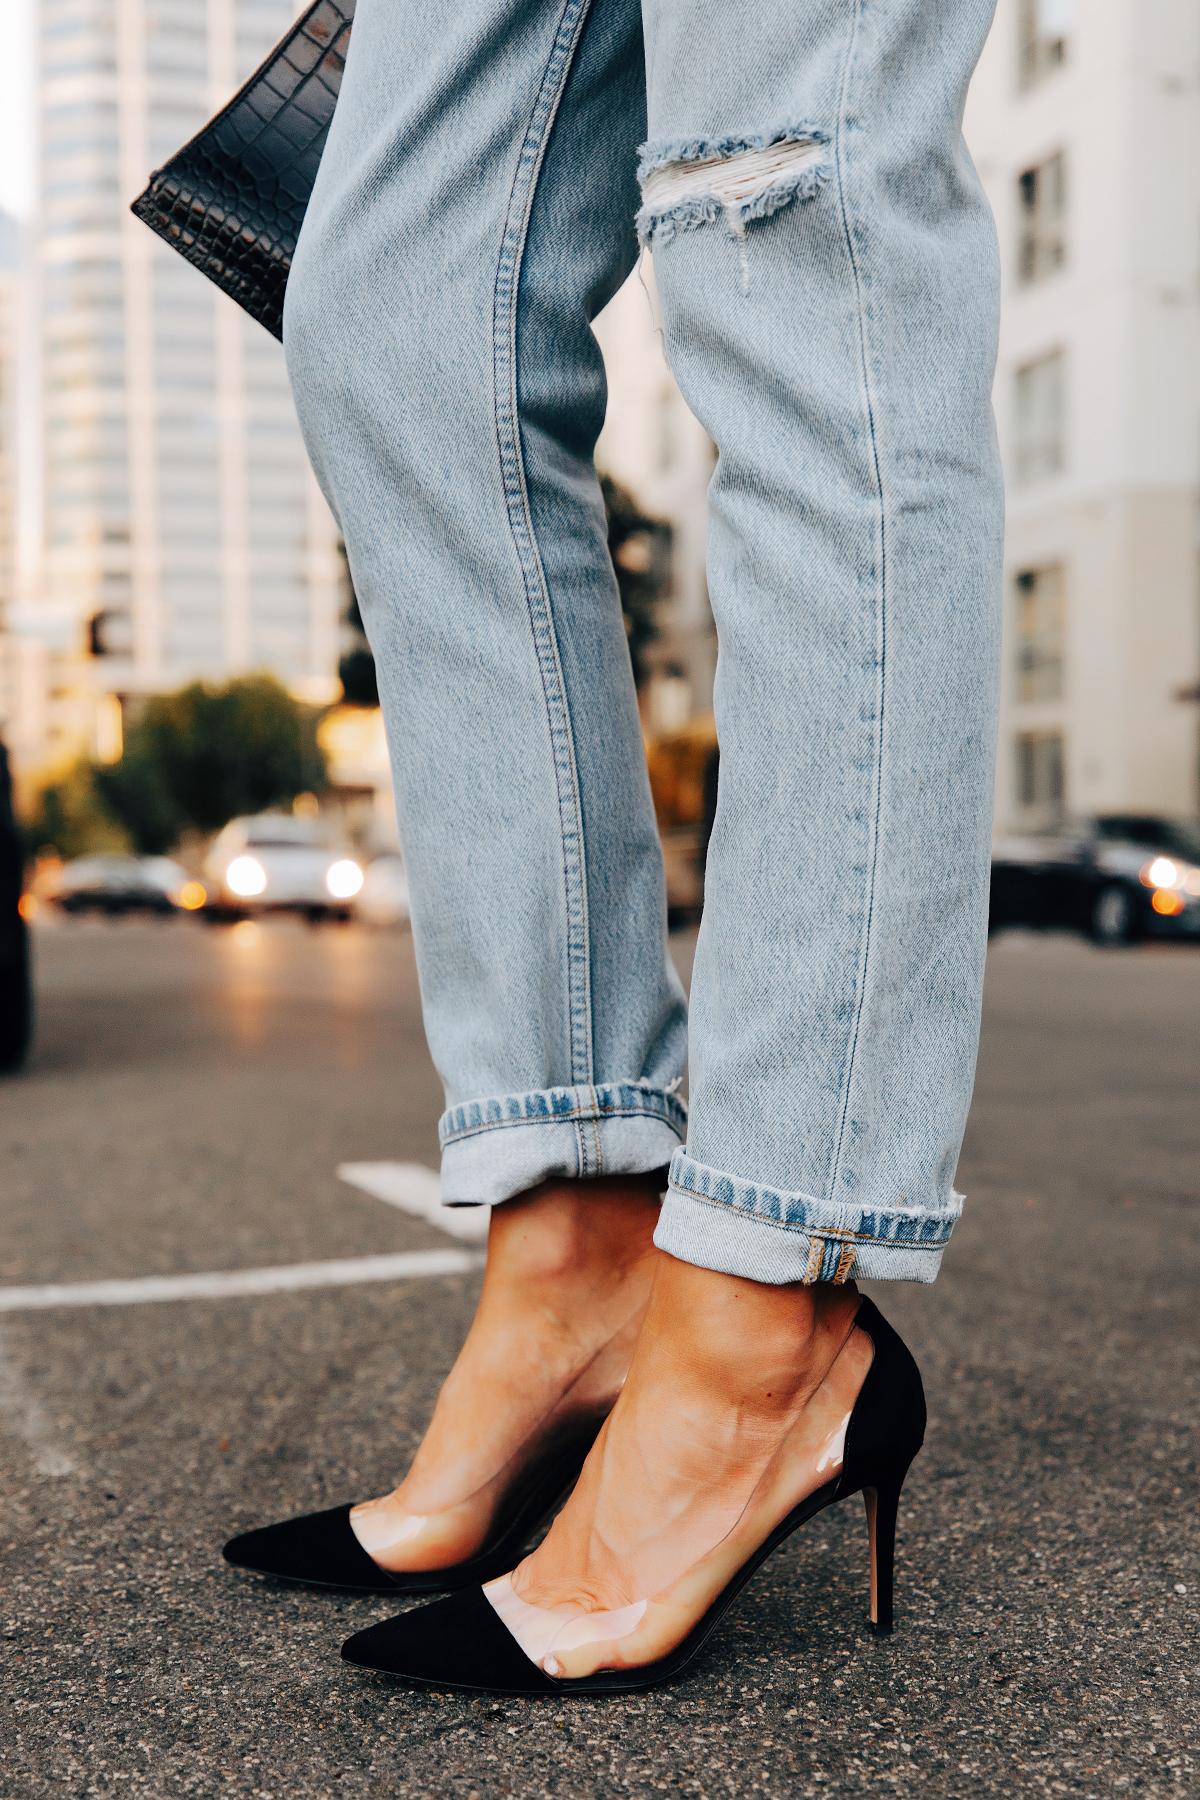 Fashion Jackson Wearing Reformation Ripped Jeans Gianvanti Rossi Plexi Black Pumps